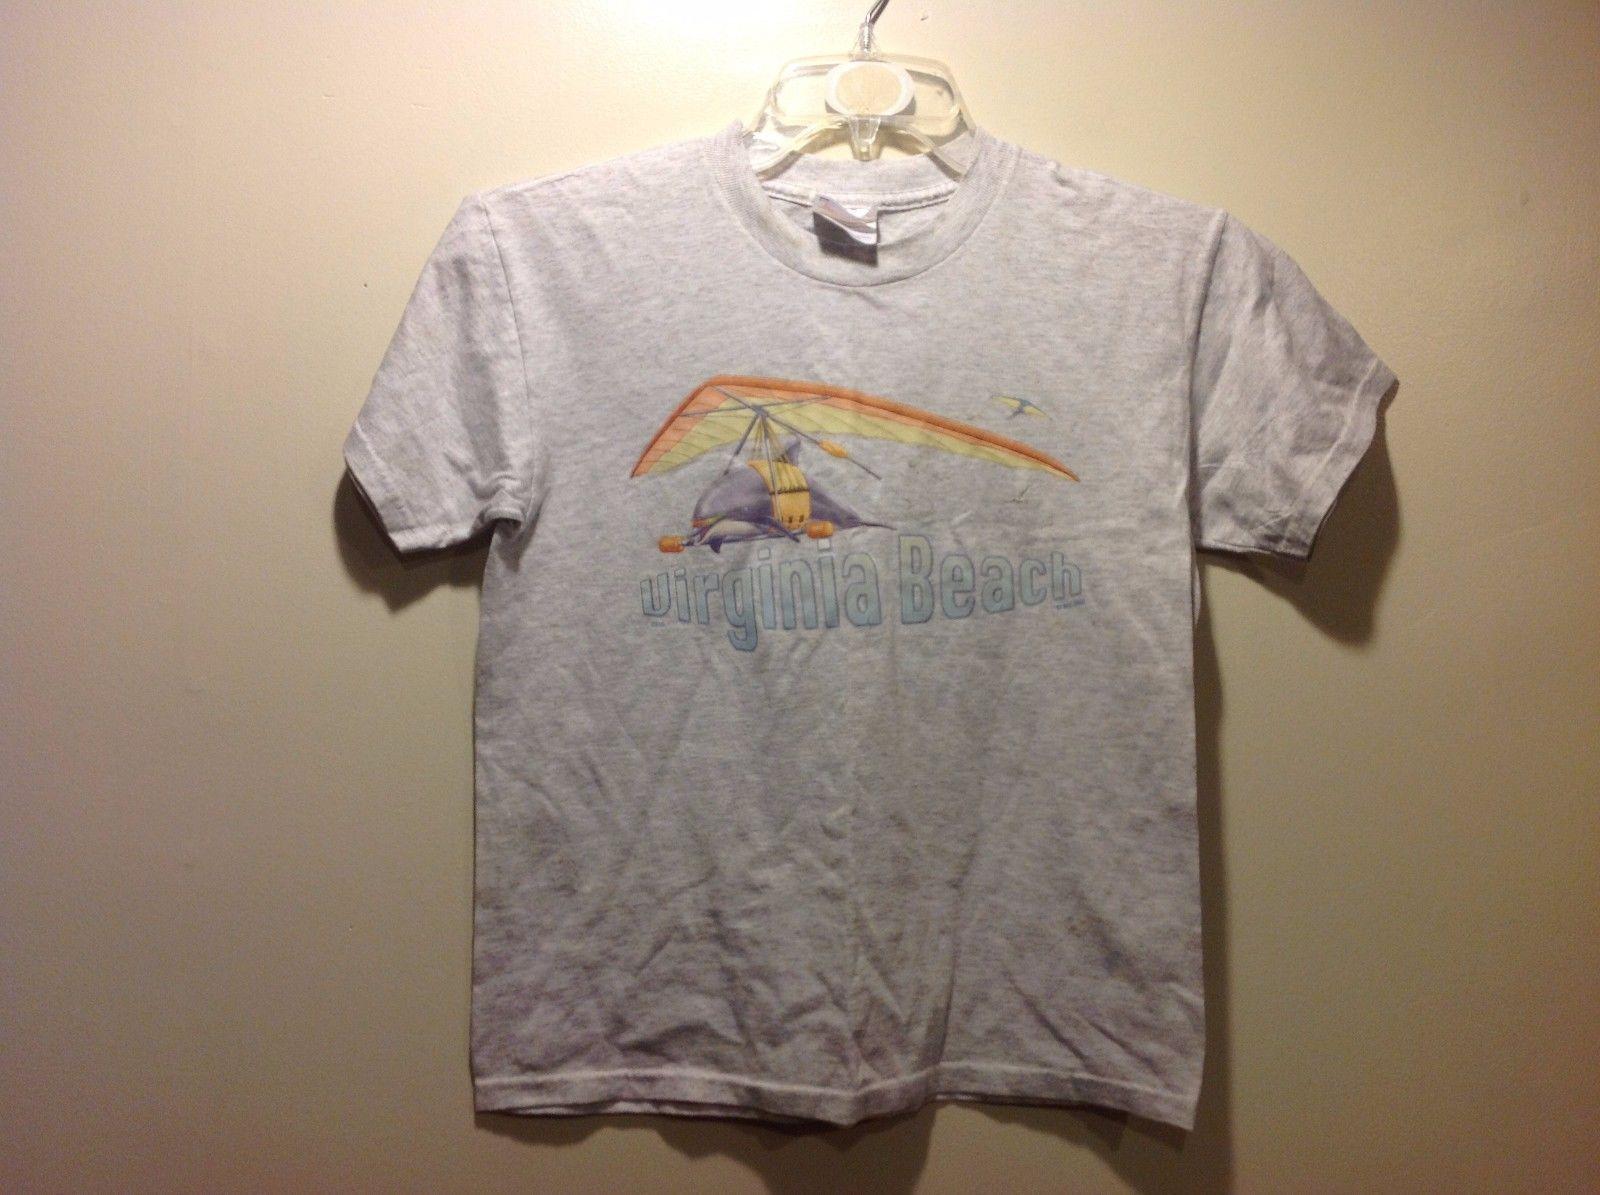 Youth Lt Gray Virginia Beach TShirt w Dolphin and Seashell Graphic Sz 14 16